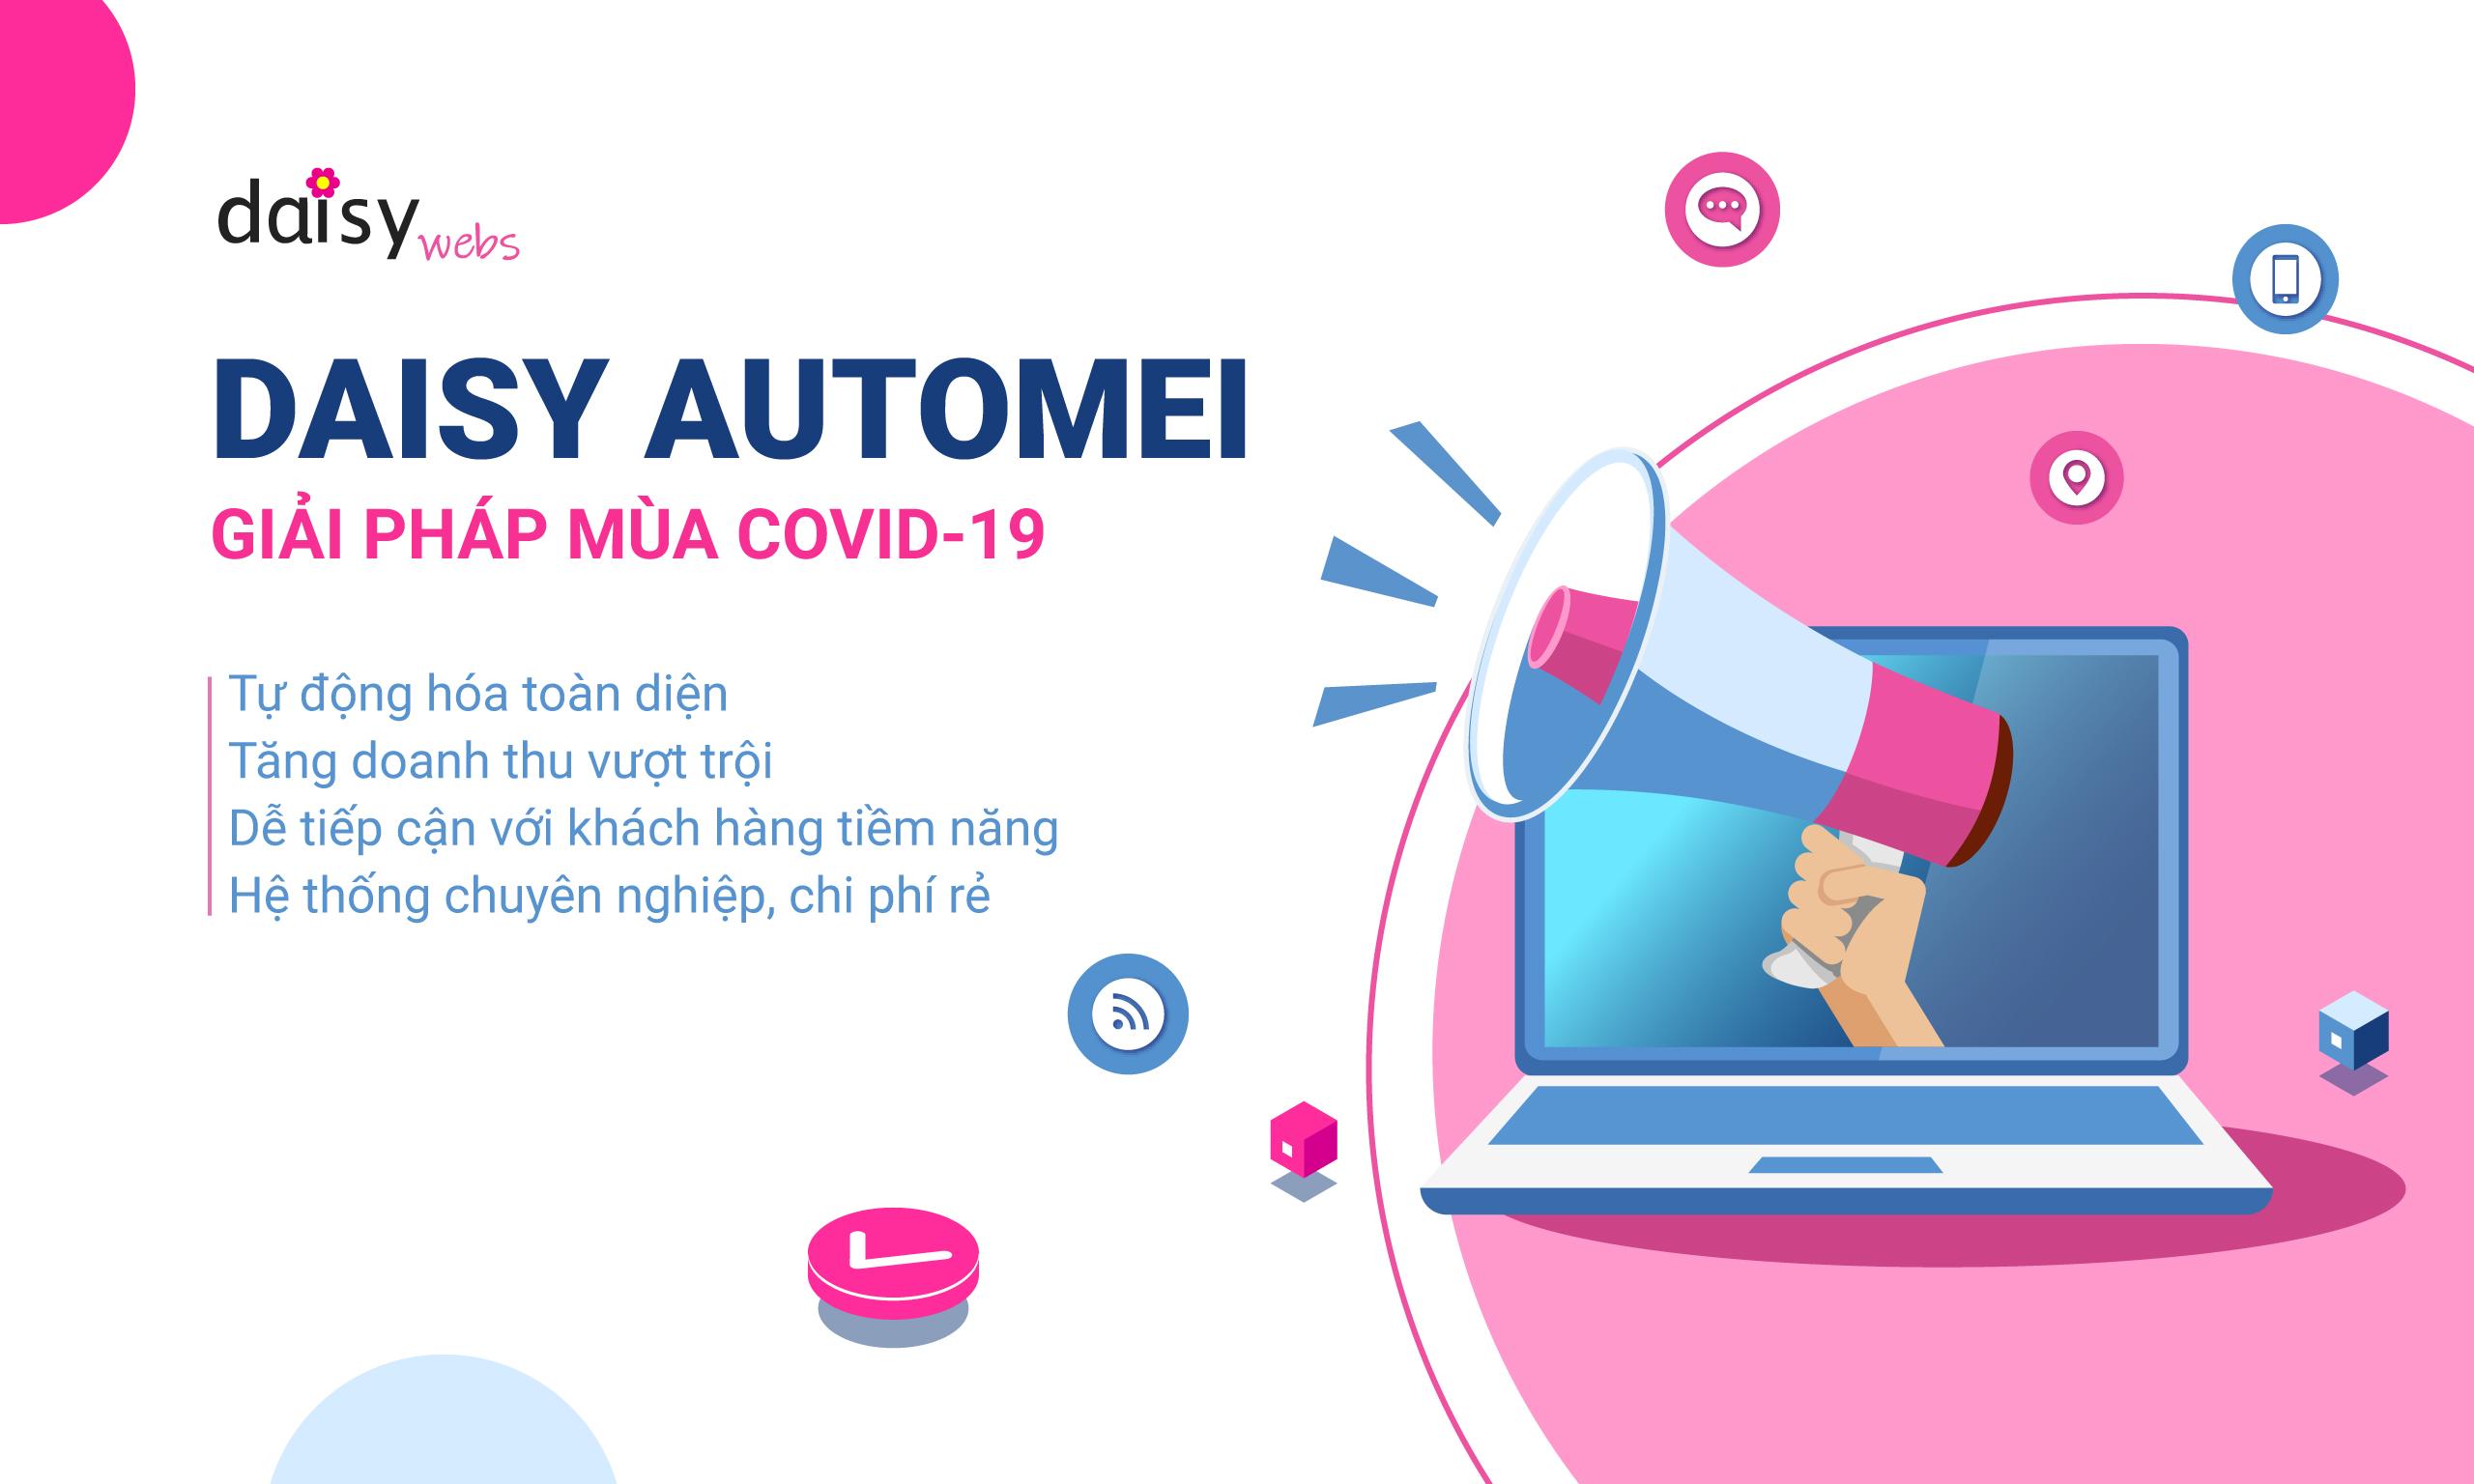 daisy-web-huong-ung-ngay-april-fool-nam-2020